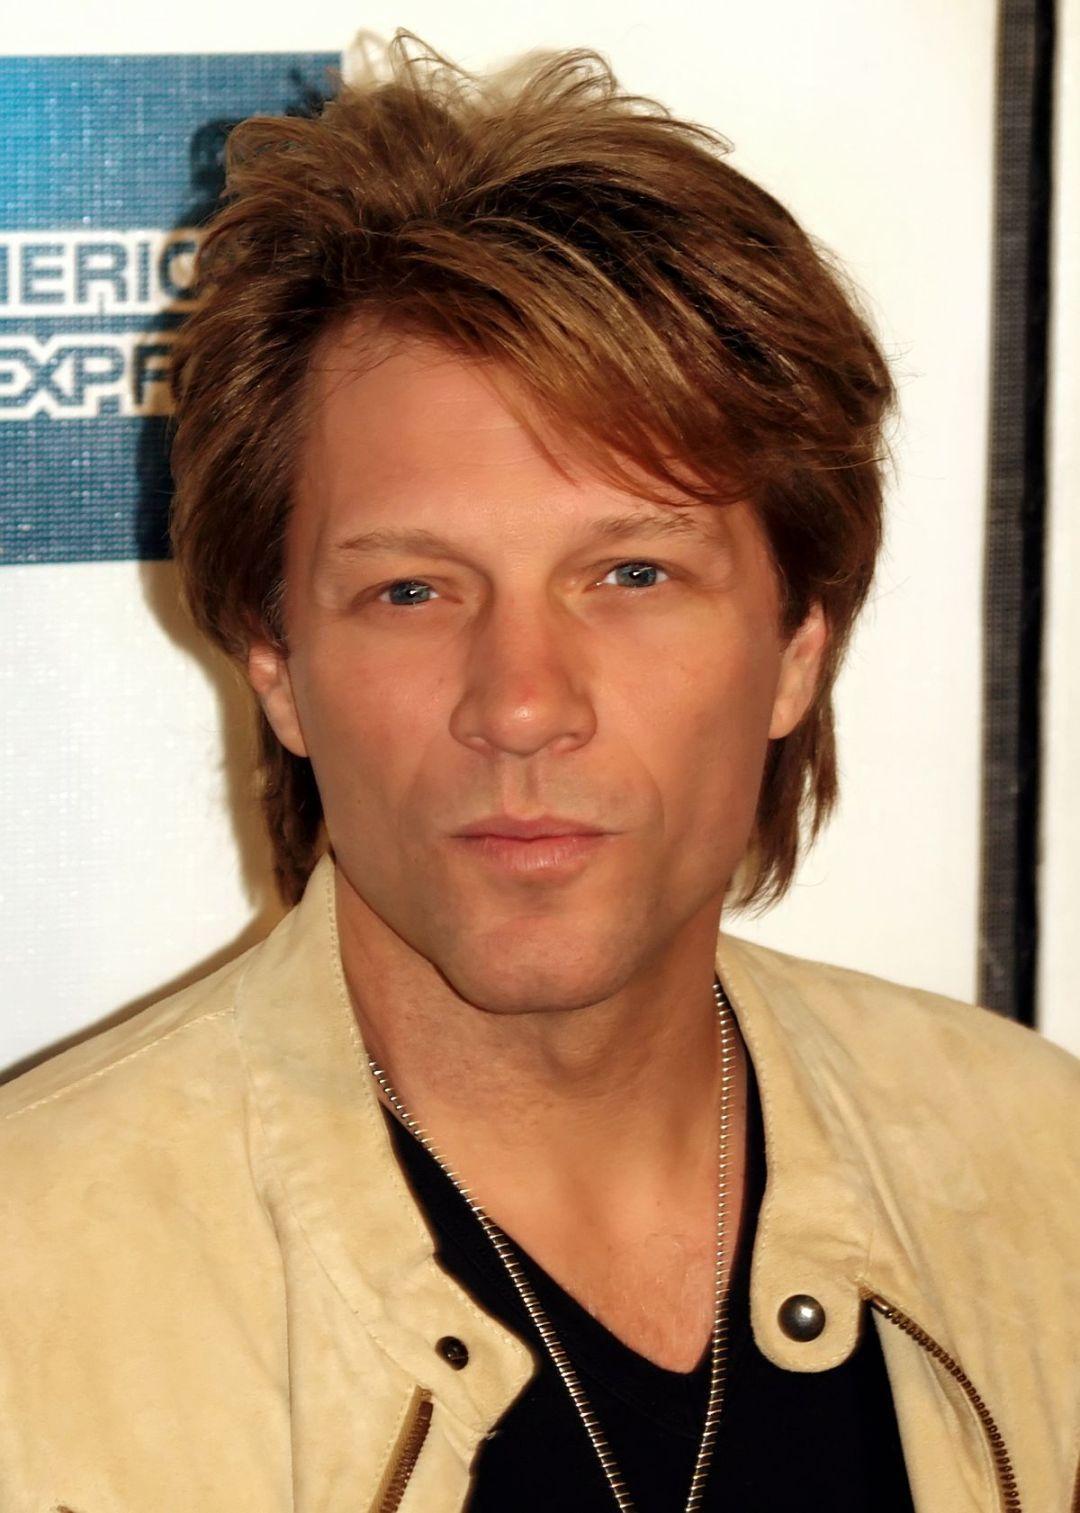 Jon Bon Jovi at the 2009 Tribeca Film Festival 3.jpg